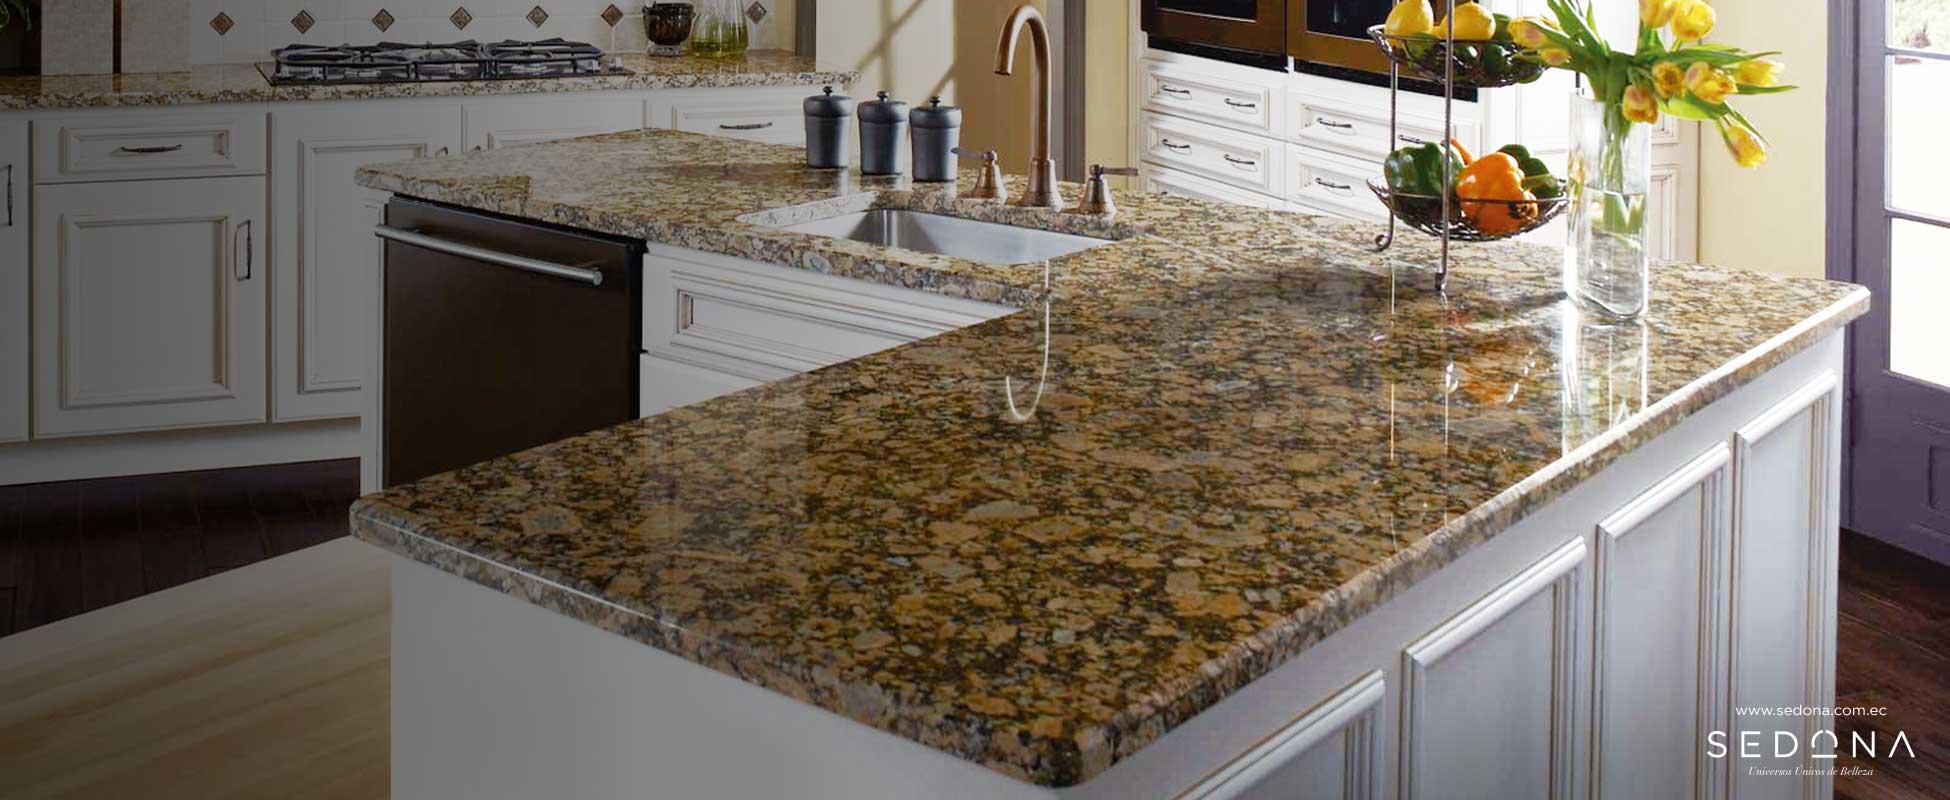 Granito fiorito sedona importador directo granitos for Colores de granito y marmol